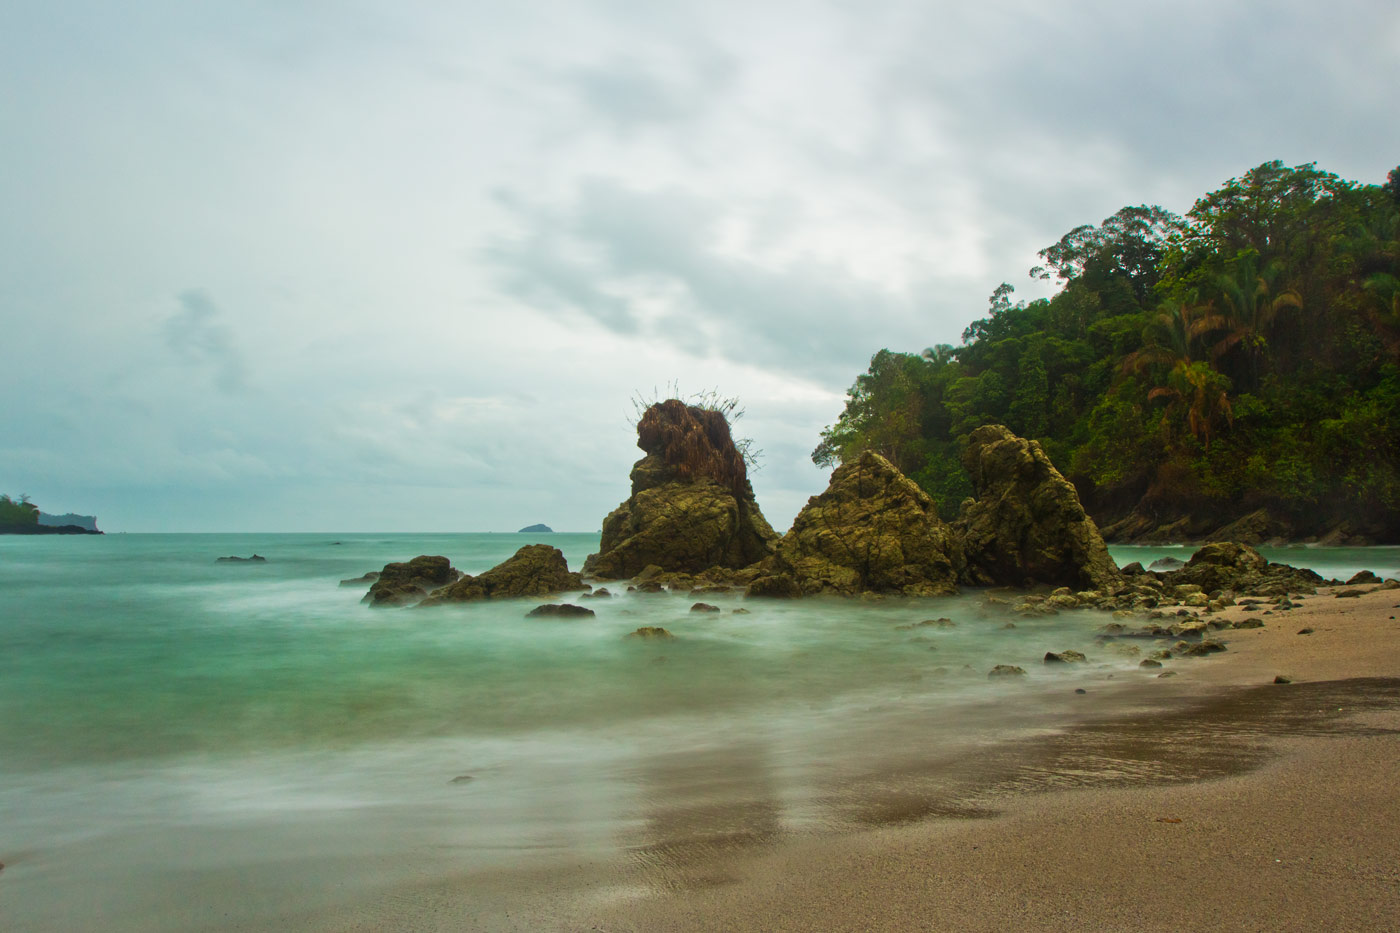 Nick-Zantop-Photography-Rainforest-4